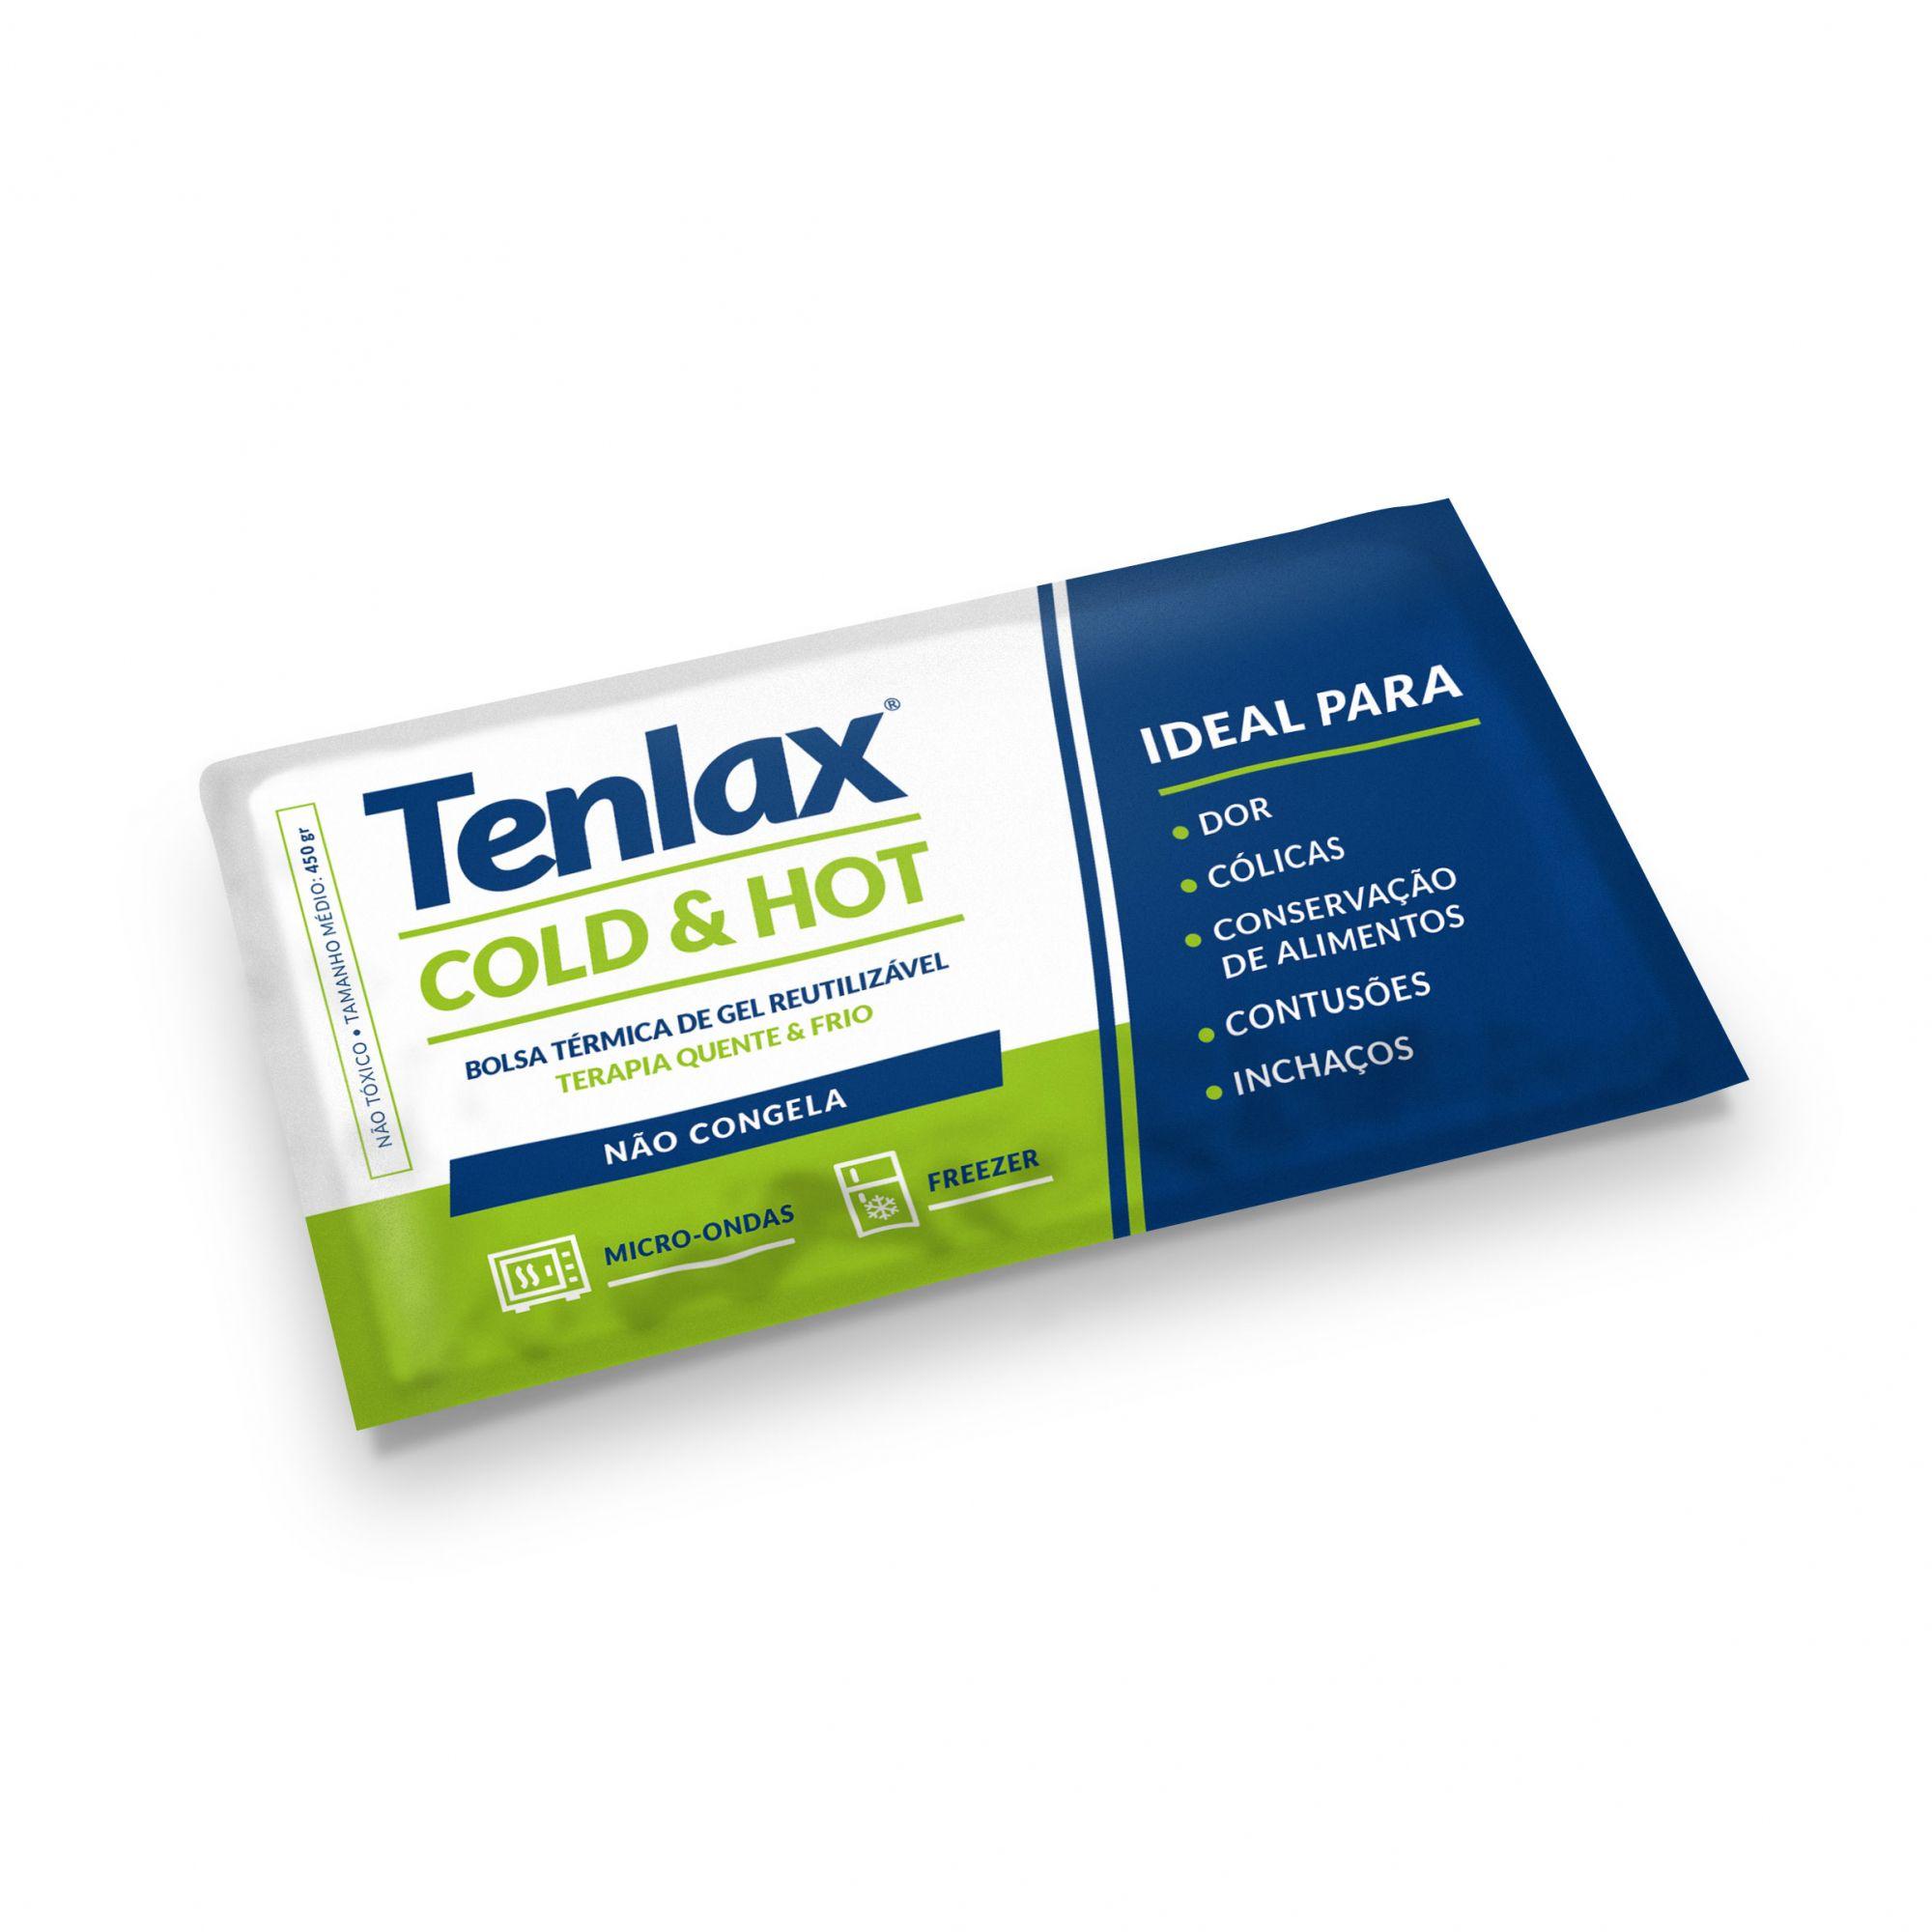 Bolsa de Gel -  450 gr - Terapia Quente/Frio - TENLAX COLD & HOT